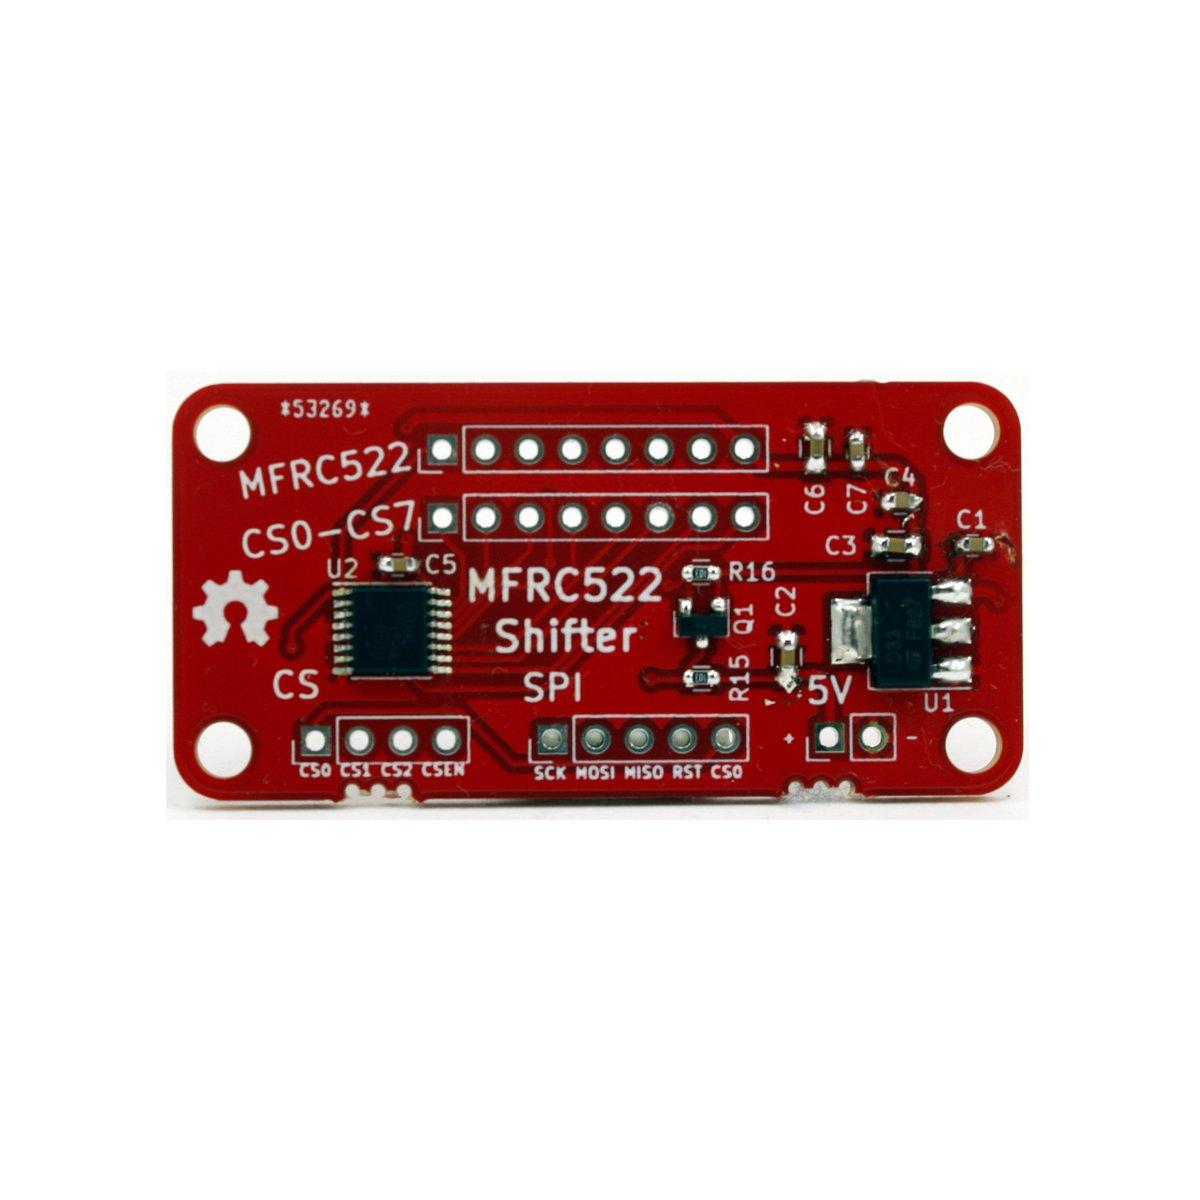 MFRC522 RFID Interface